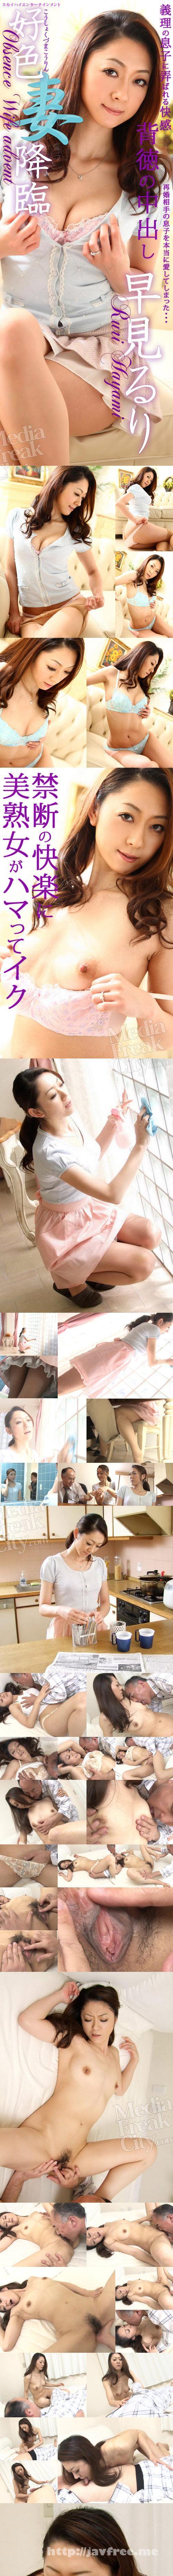 [SKY 167] 好色妻降臨 Vol.9 : 早見るり 早見るり 好色妻降臨 SKY Ruri Hayami Dirty Minded Wife Advent